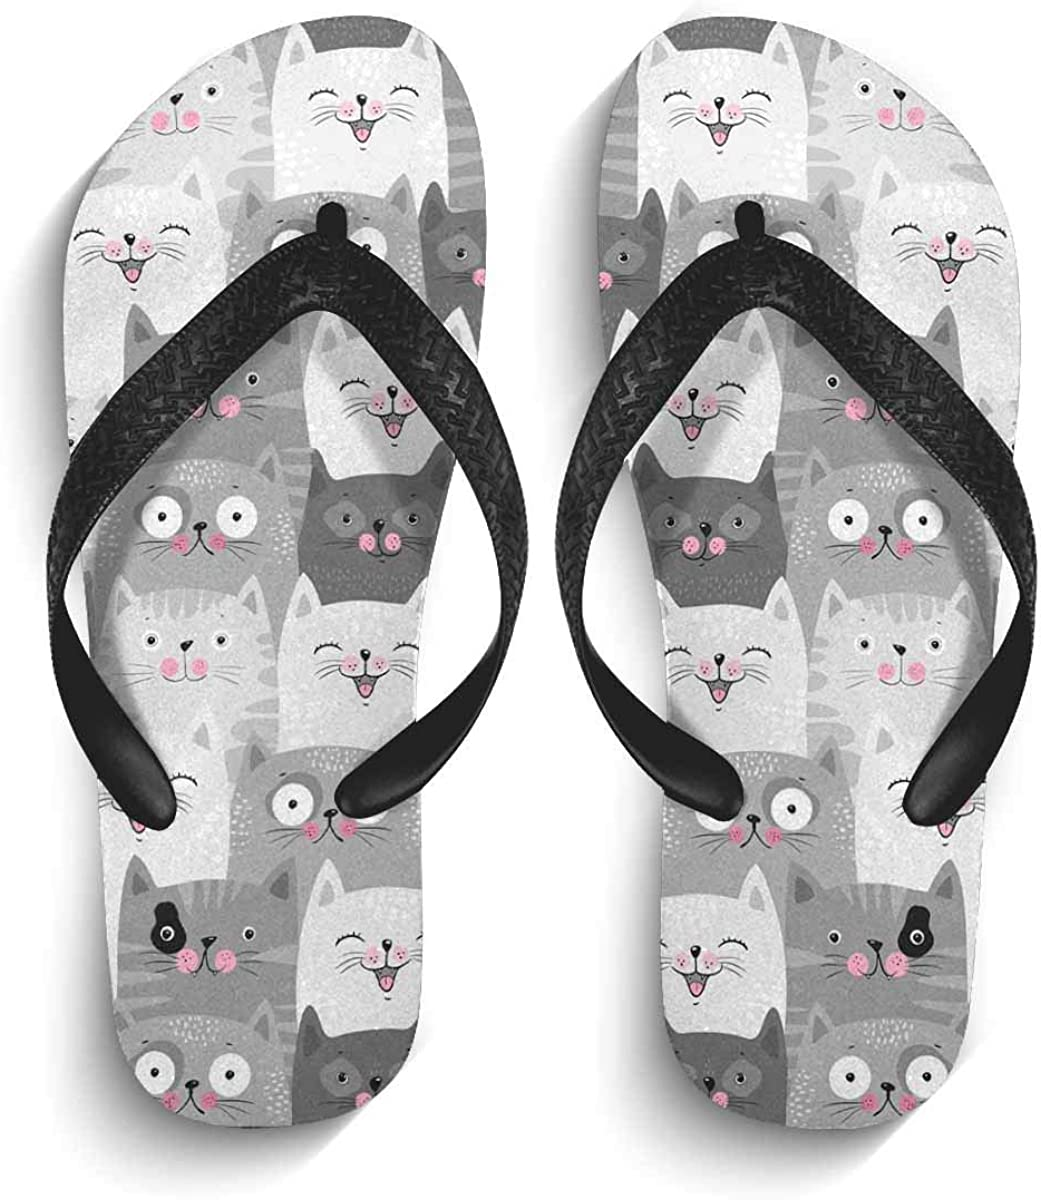 InterestPrint Non-Slip Flip Flops Black Straps Funny Grey Cats Cute Pattern Background Summer Beach Thong Sandal for Men S